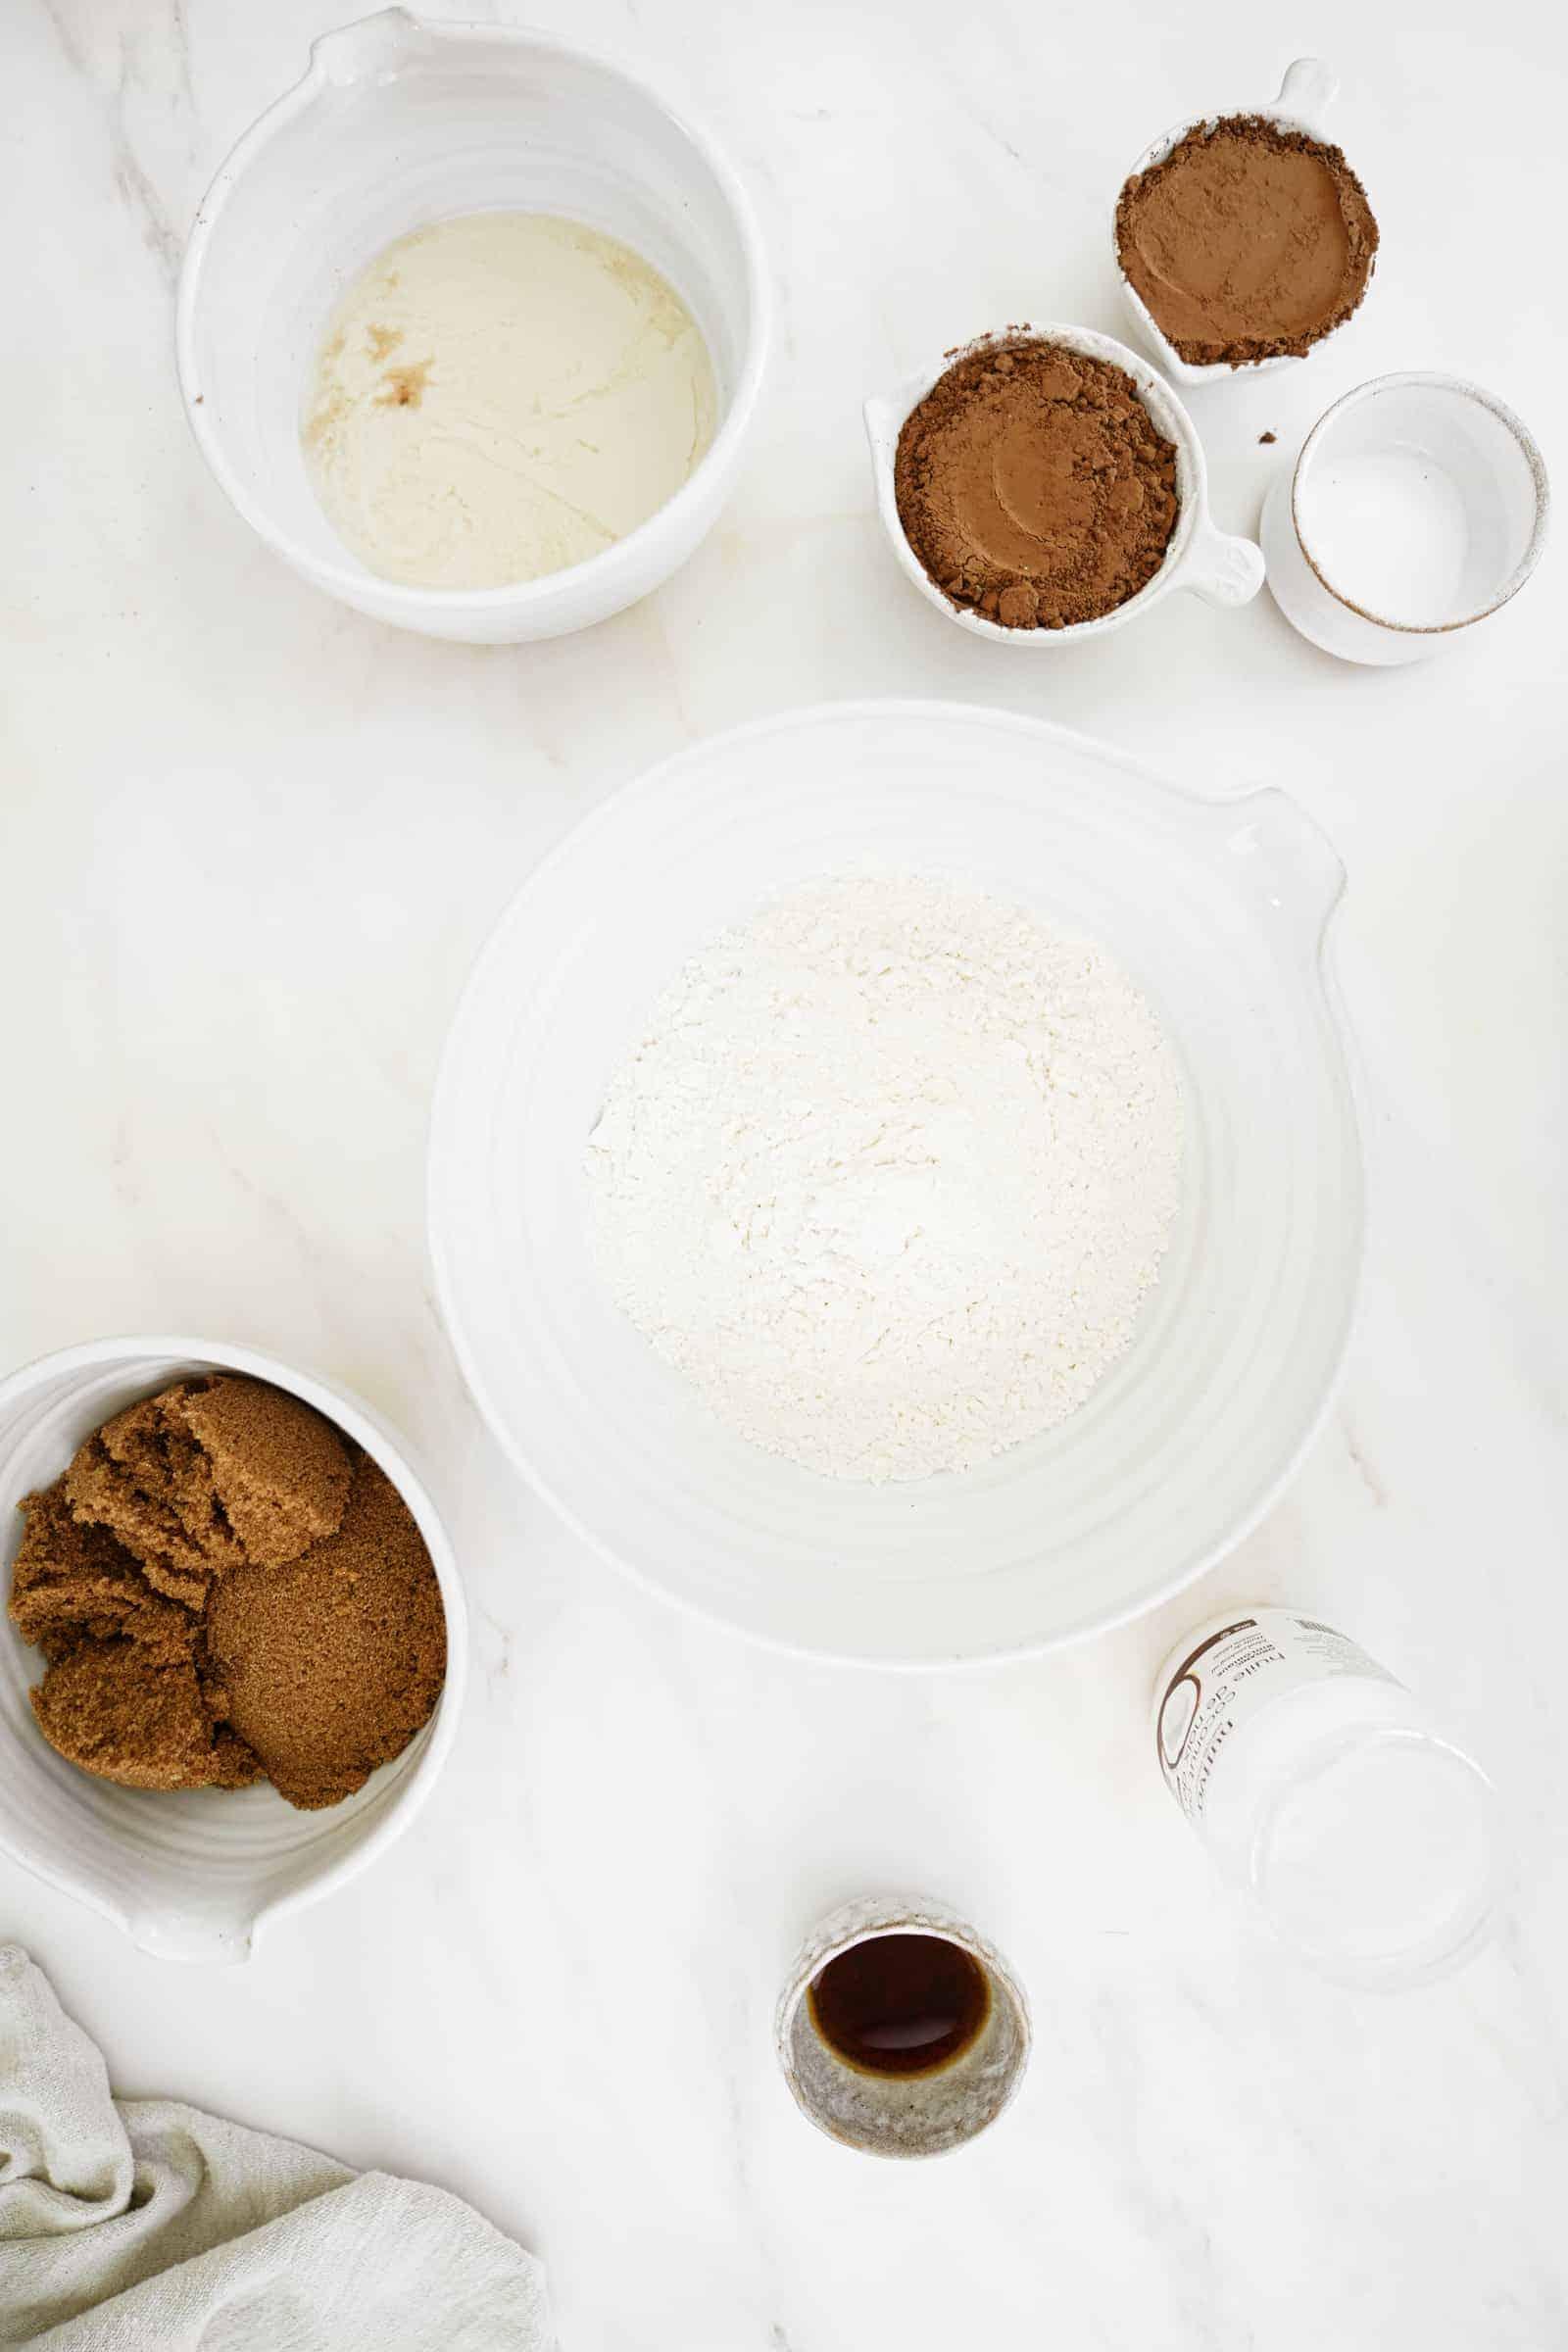 Ingredients for vegan chocolate cake